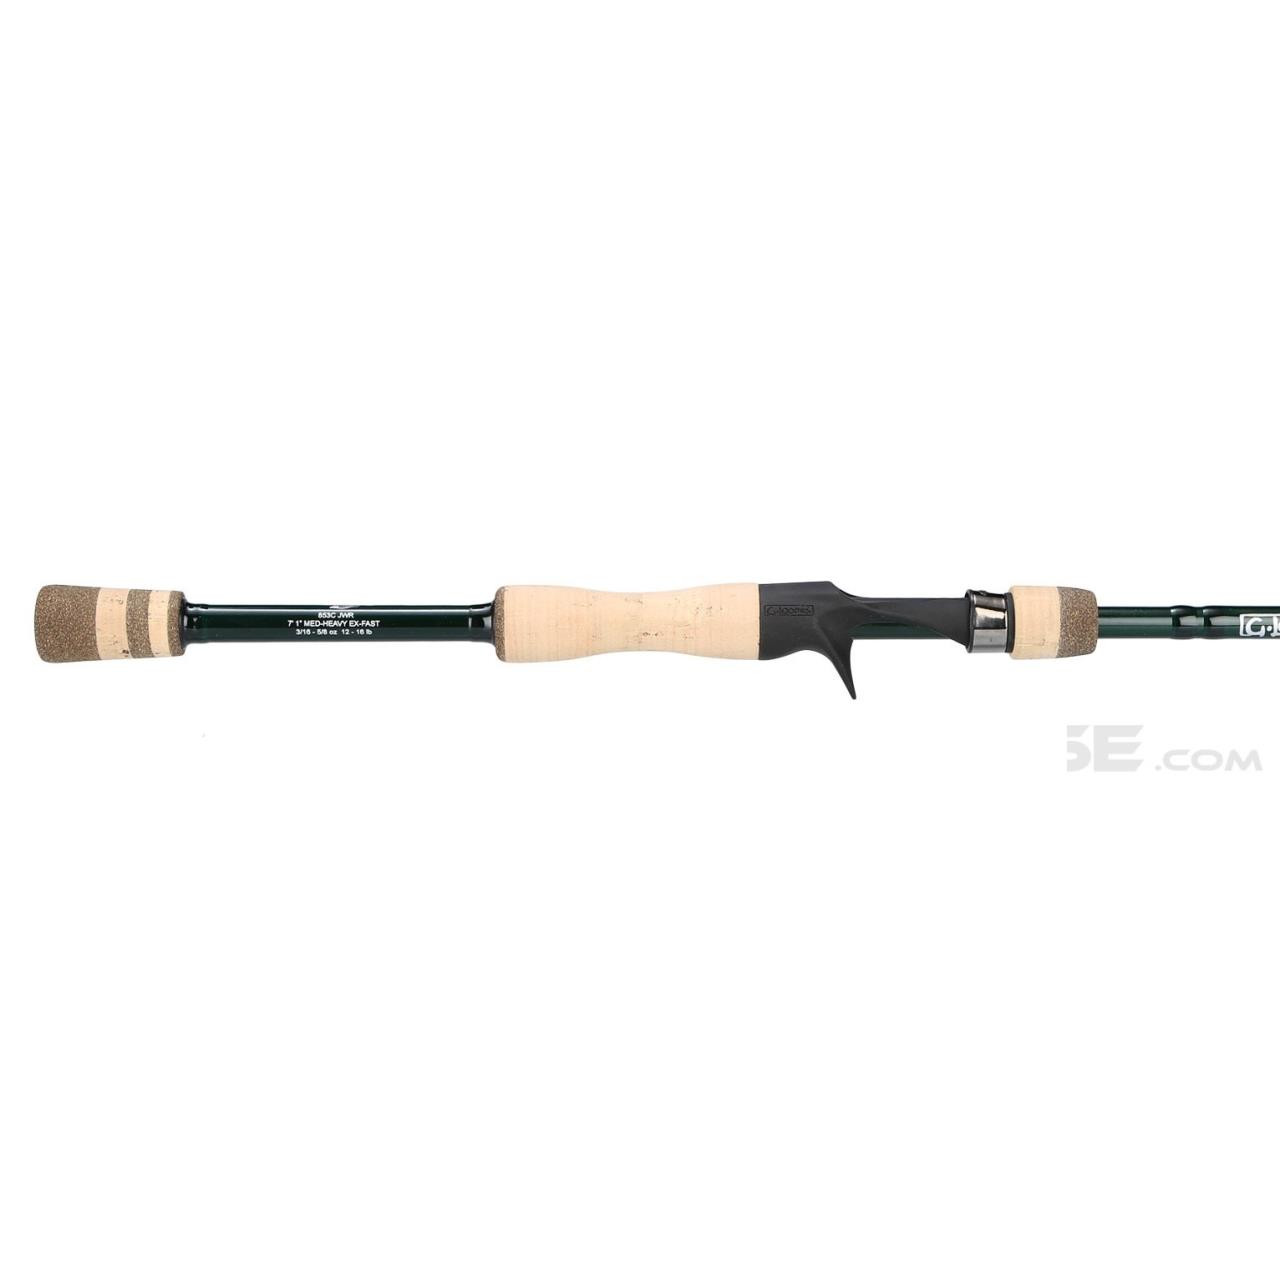 Loomis GLX Bass Casting Rod - 601040125342